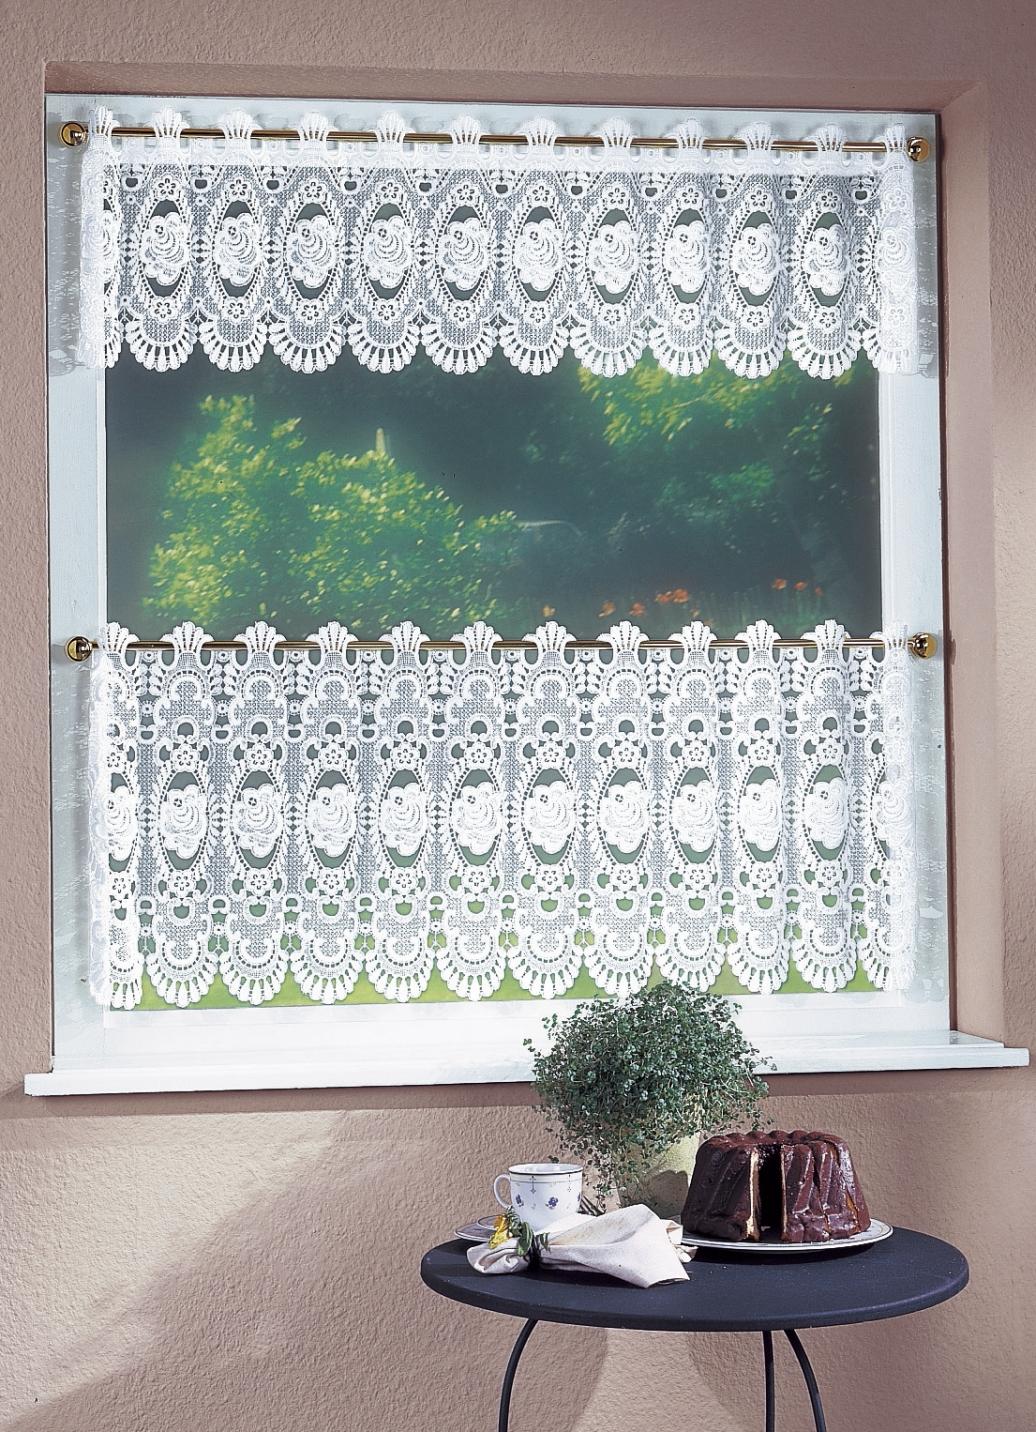 kurzgardine in verschiedenen farben gardinen bader. Black Bedroom Furniture Sets. Home Design Ideas